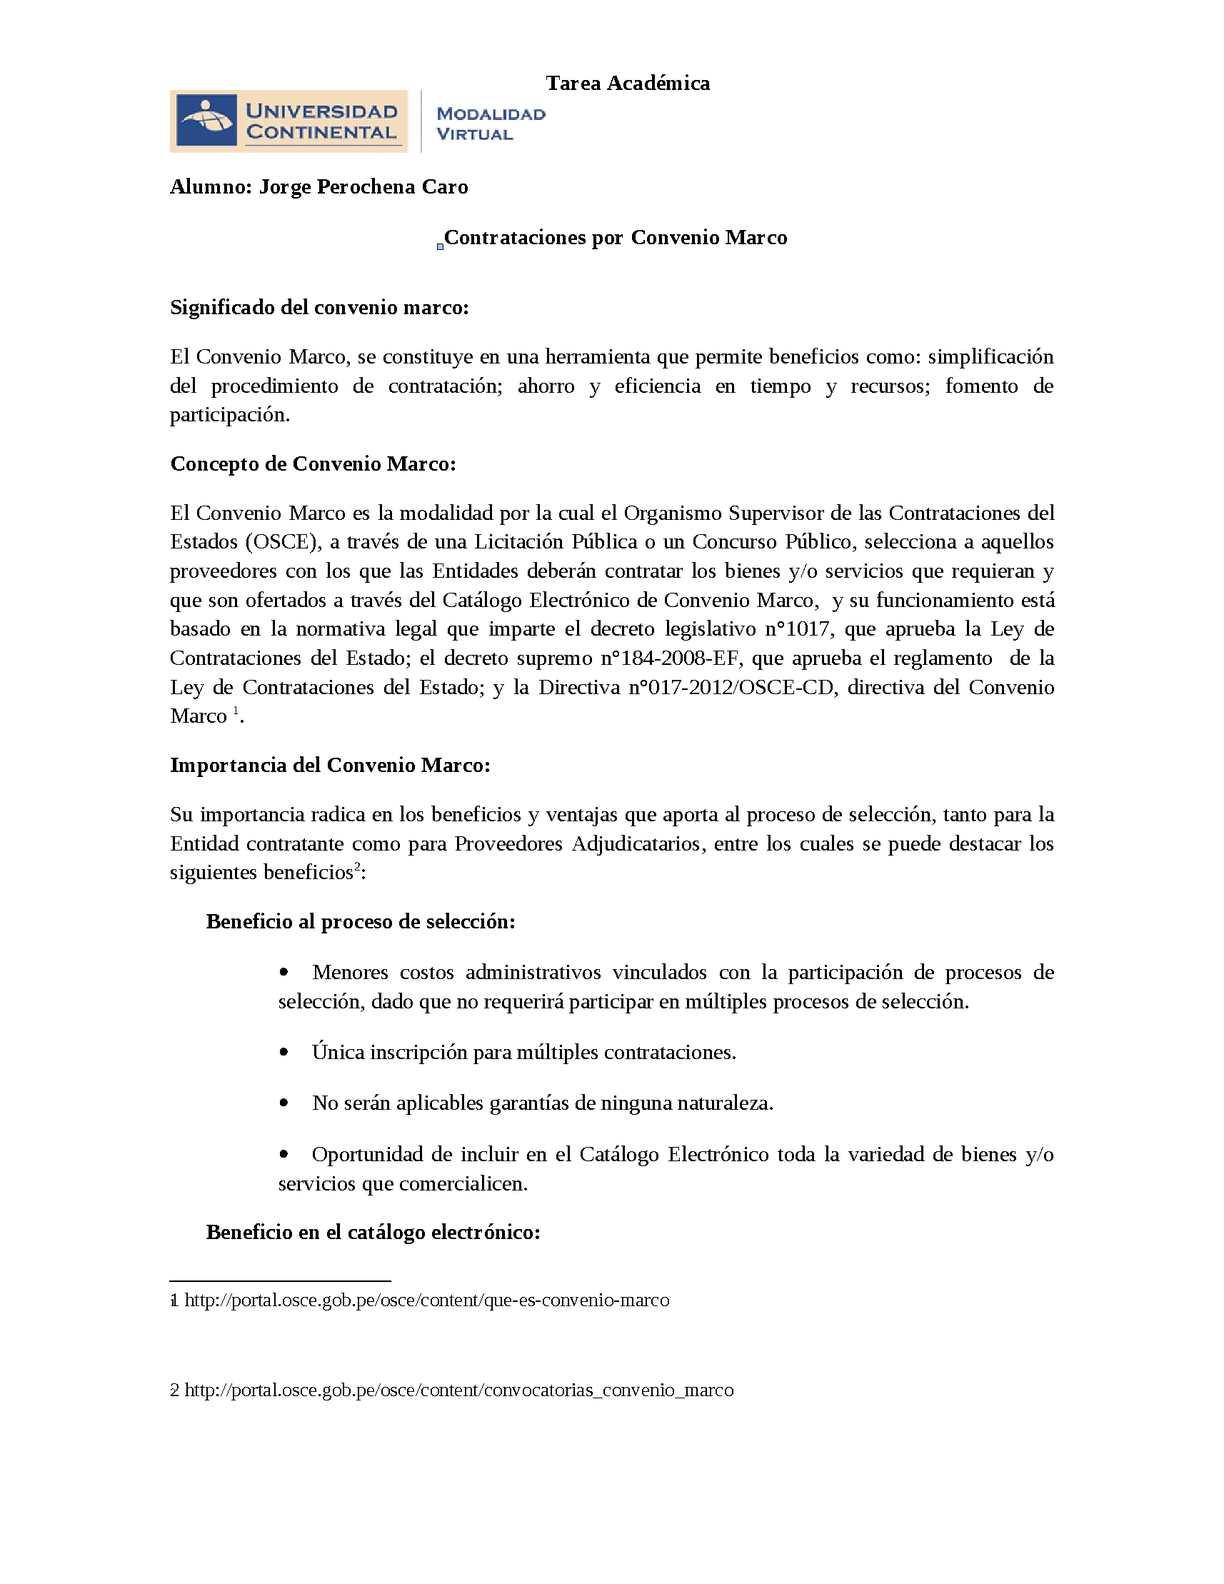 Calaméo - Parte Iv Sobre Convenio Marco - Jorge Perochena